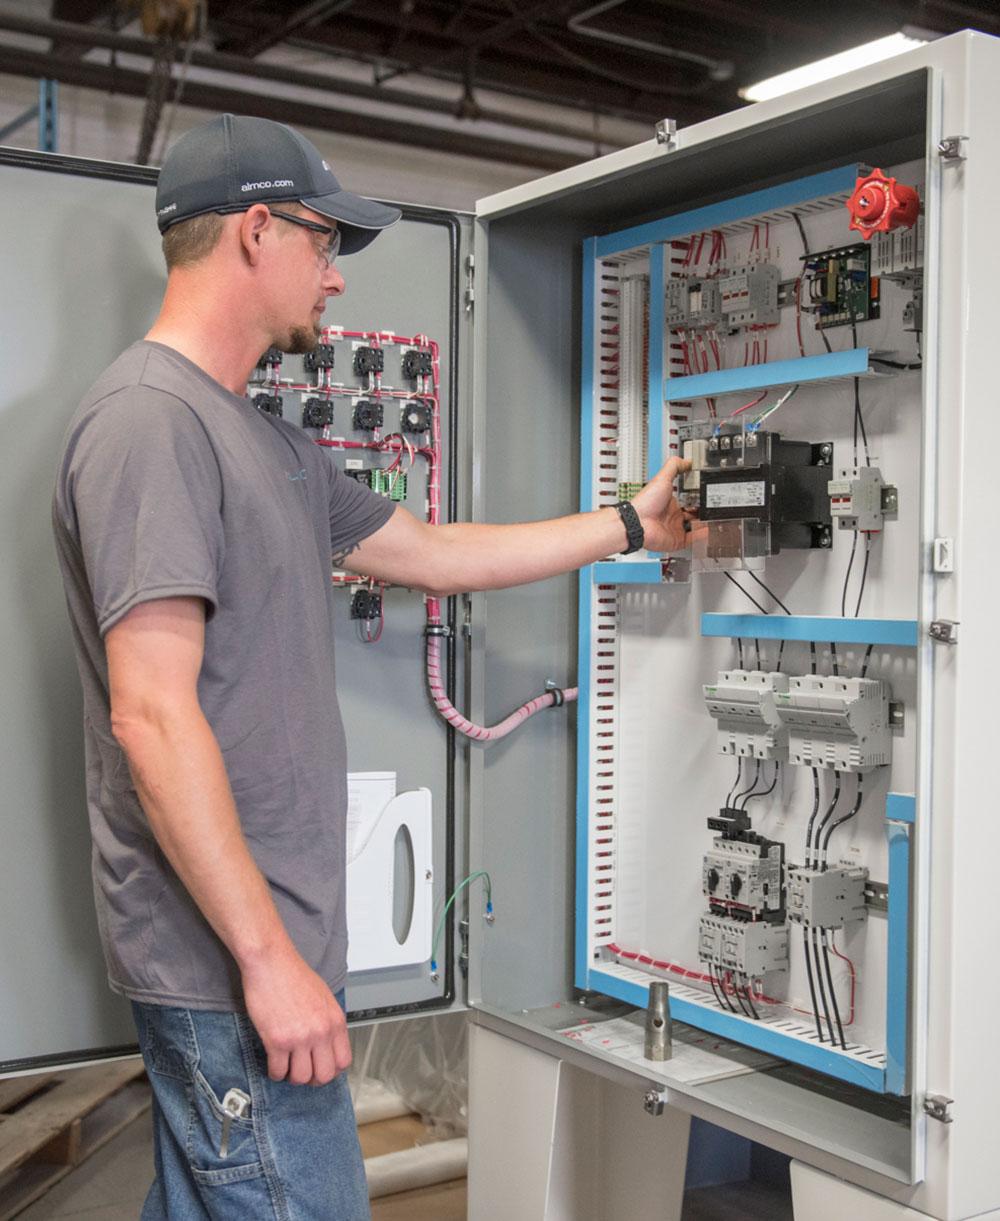 Employee working on electrical panel